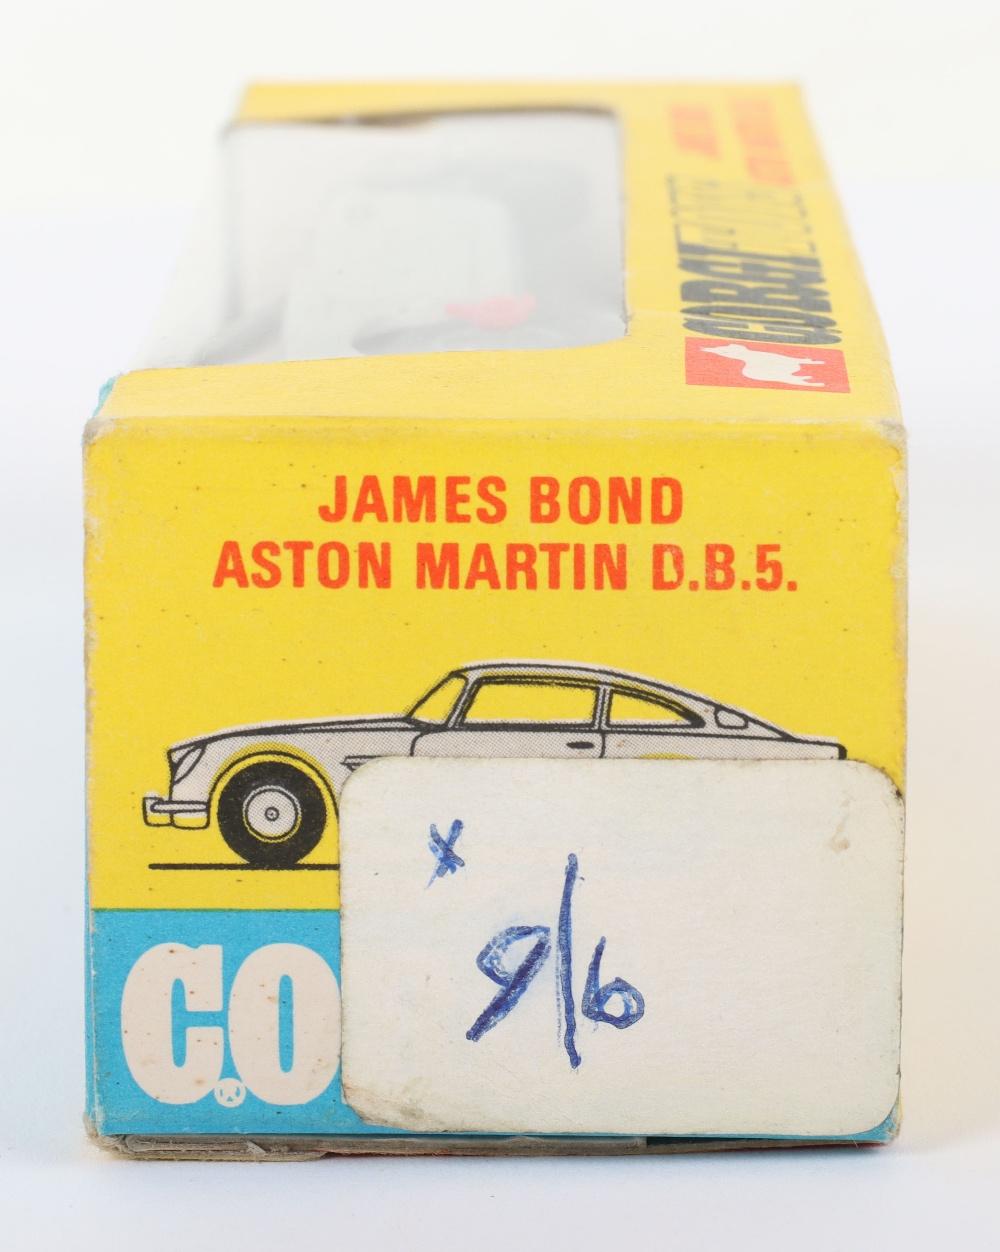 Corgi Toys 270 James Bond Aston Martin slim window box - Image 7 of 8